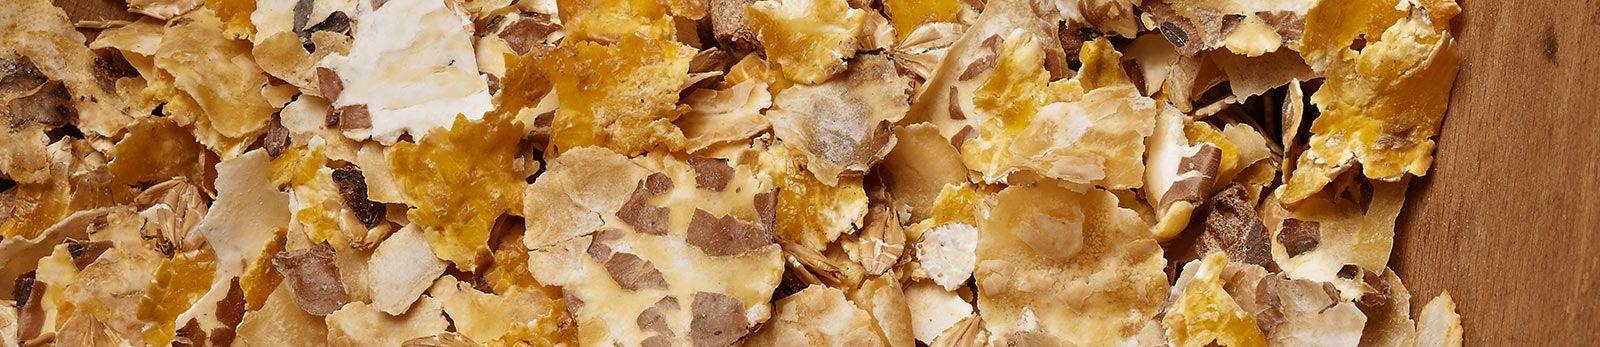 Cereali, Legumi & Granaglie